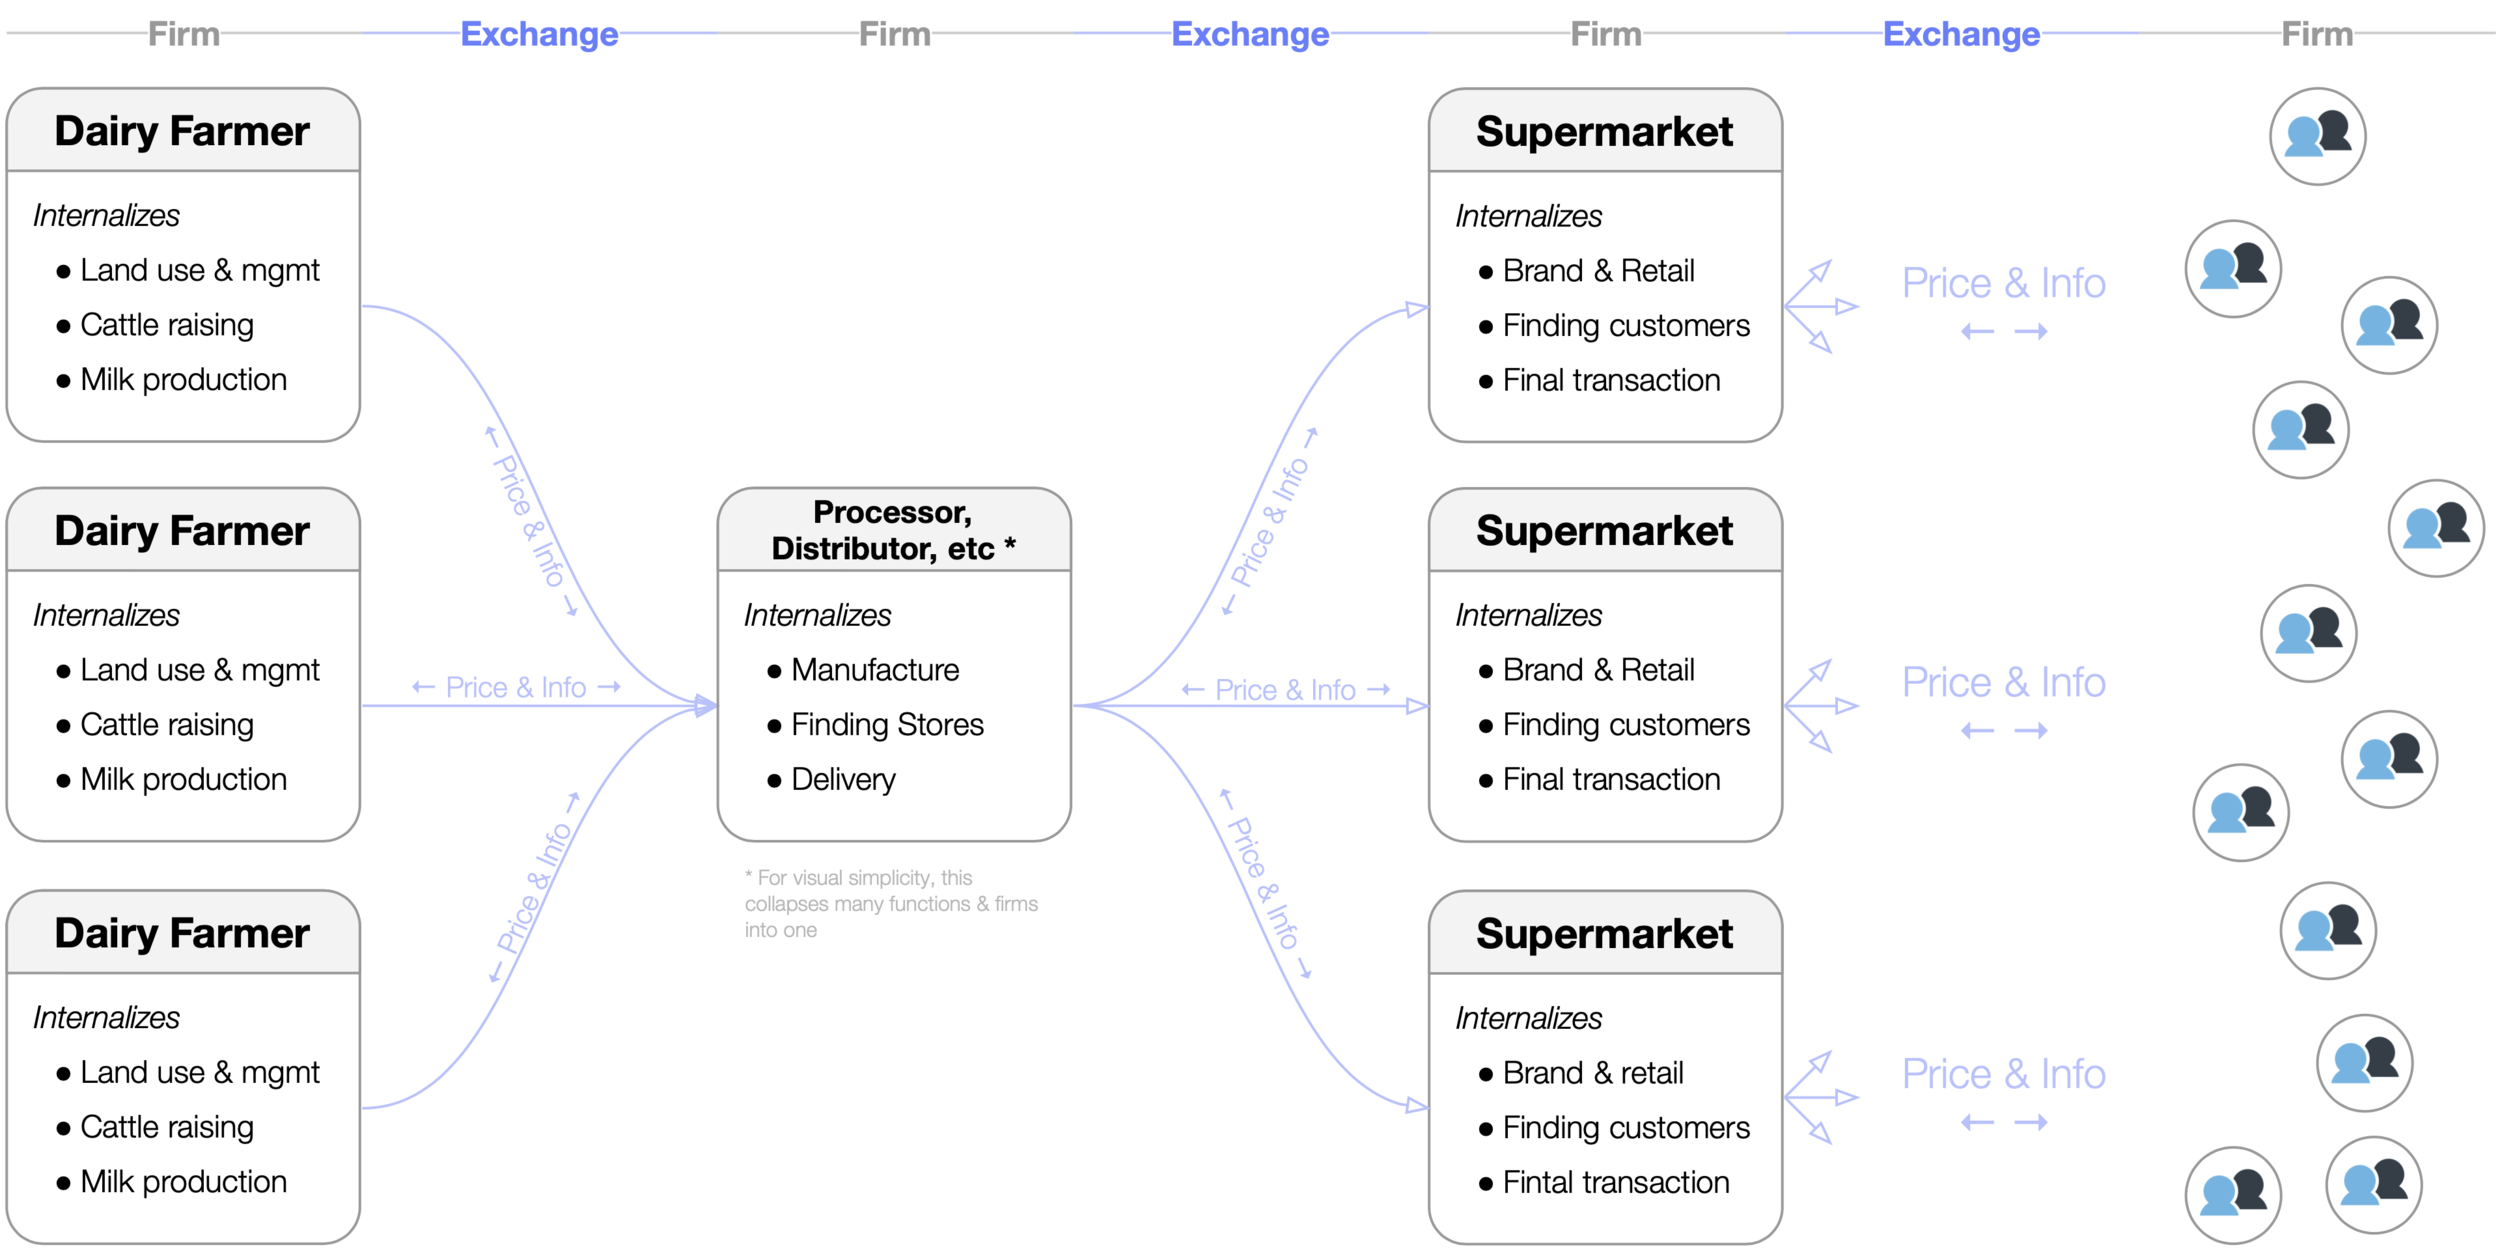 value_chain_coase_hayek_firm_market.png